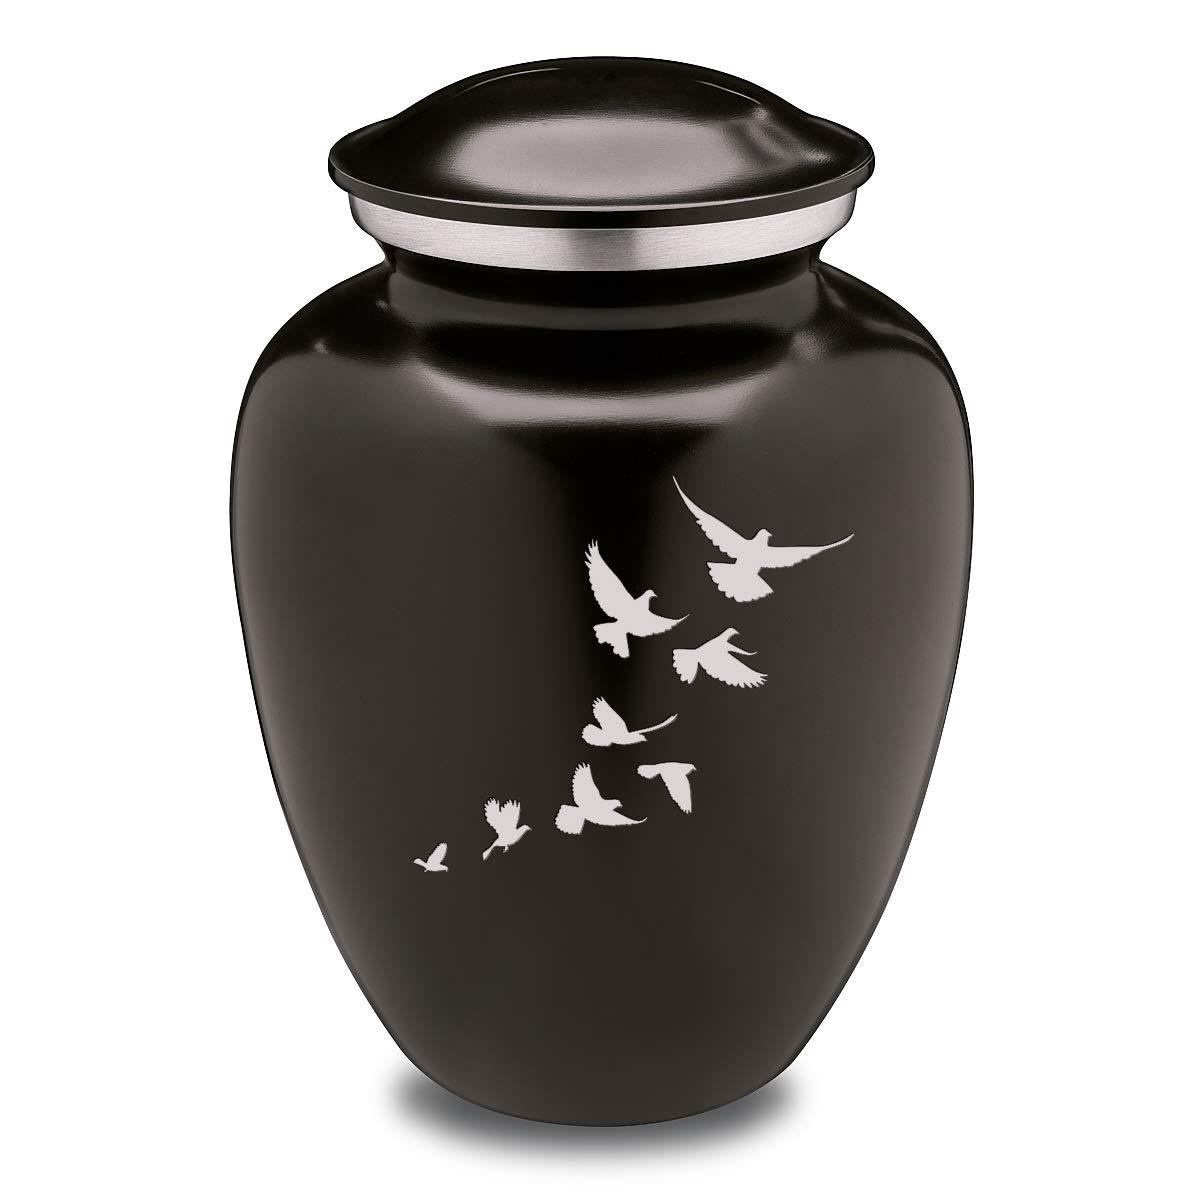 Adult Embrace Doves Cremation Urn for Ashes